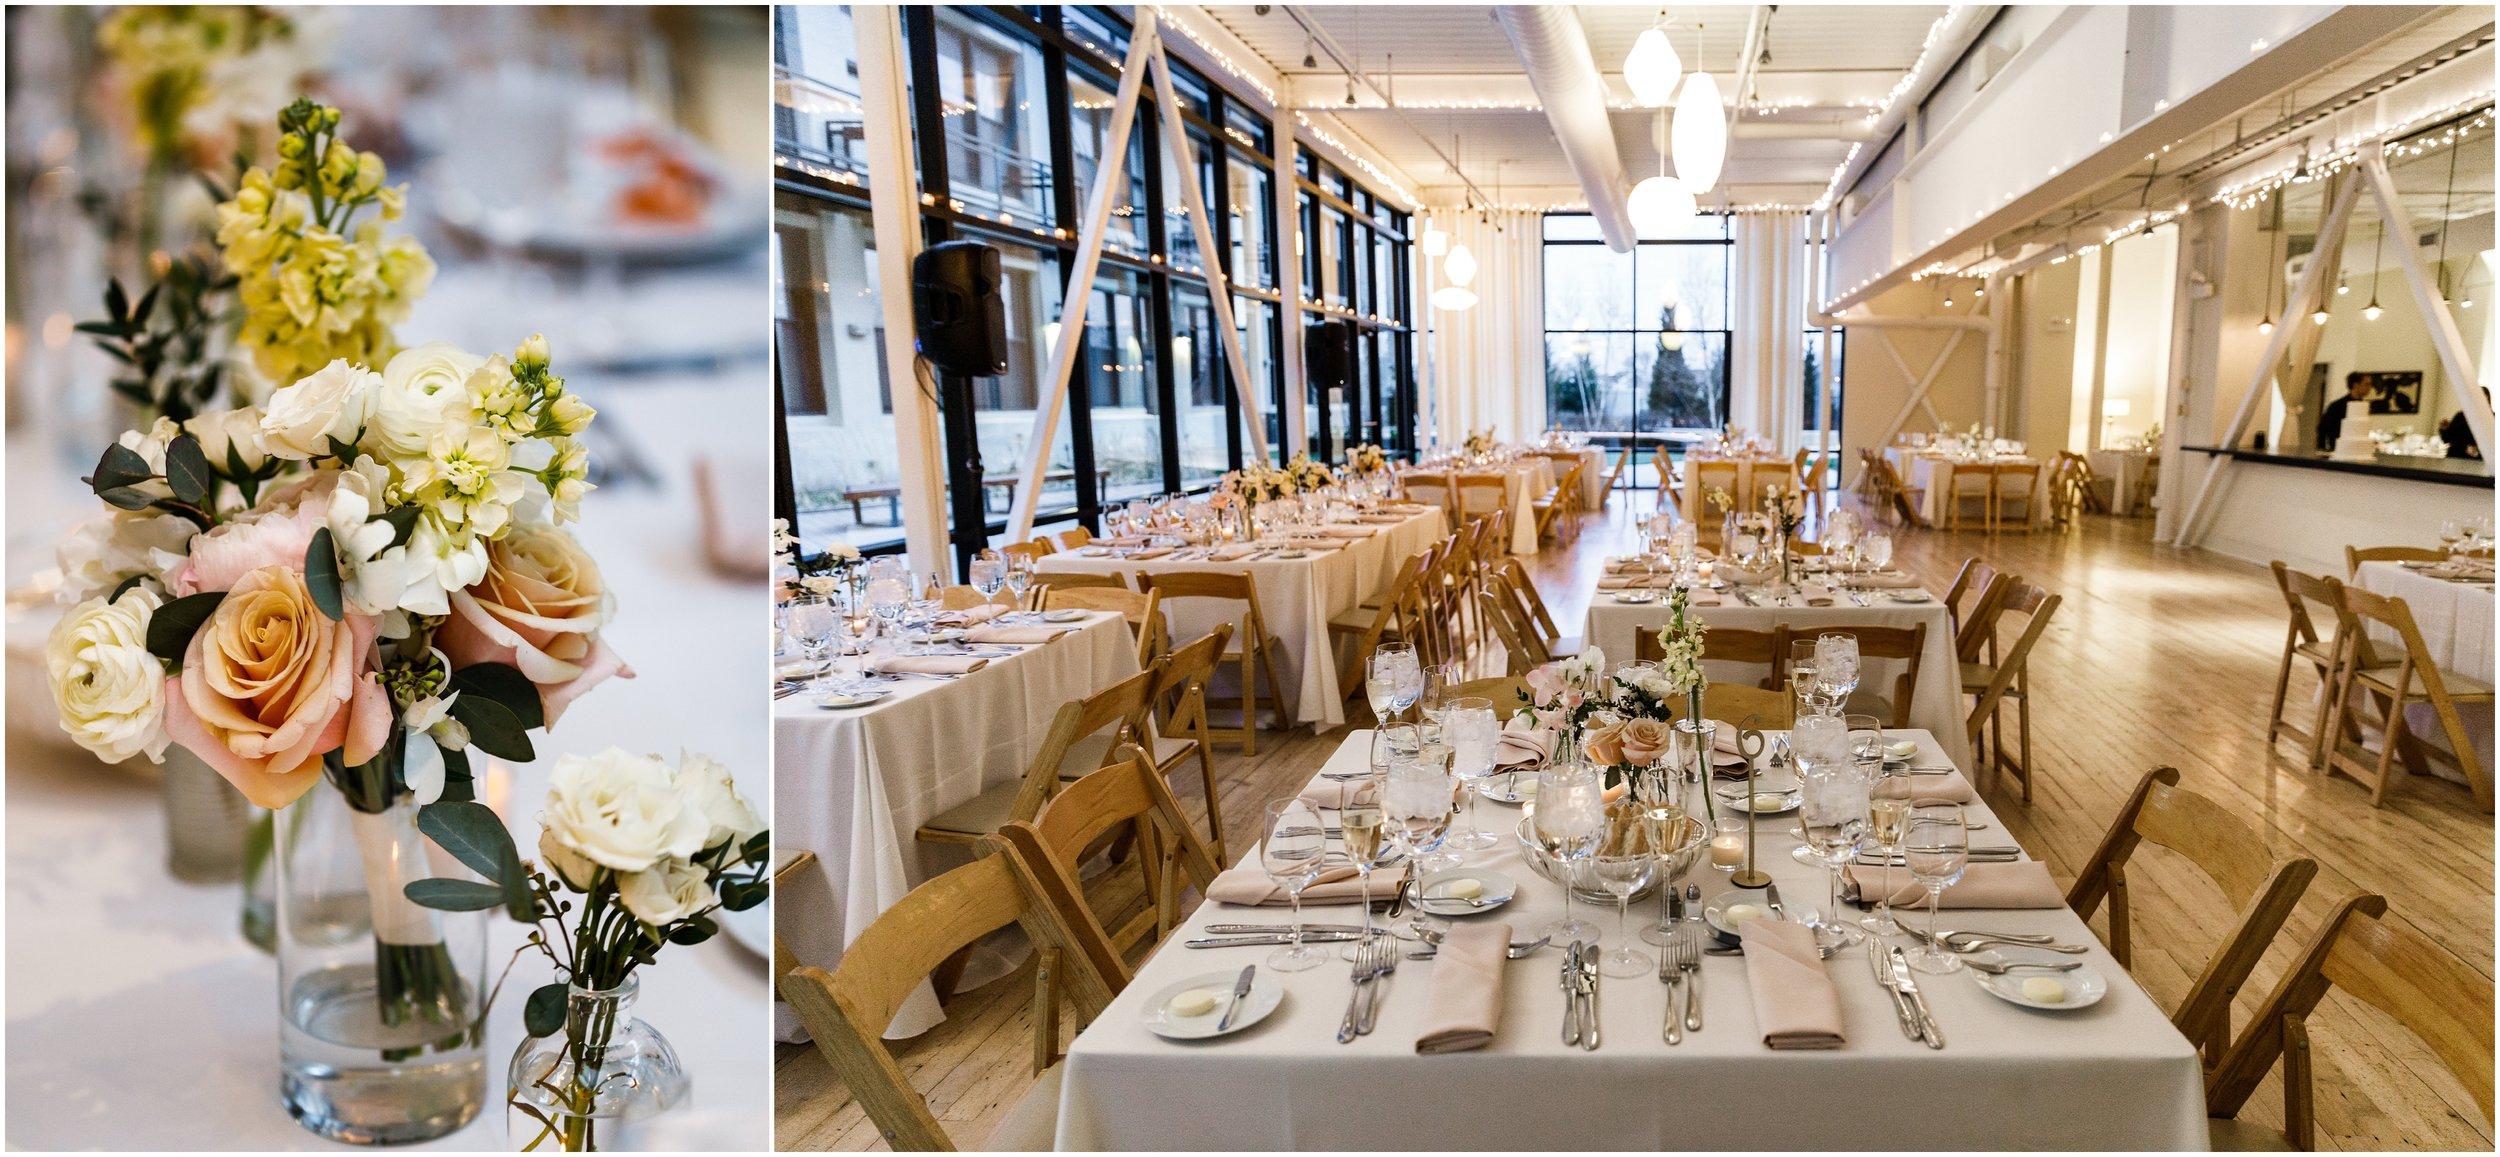 wedding flowers decorating reception tabletops